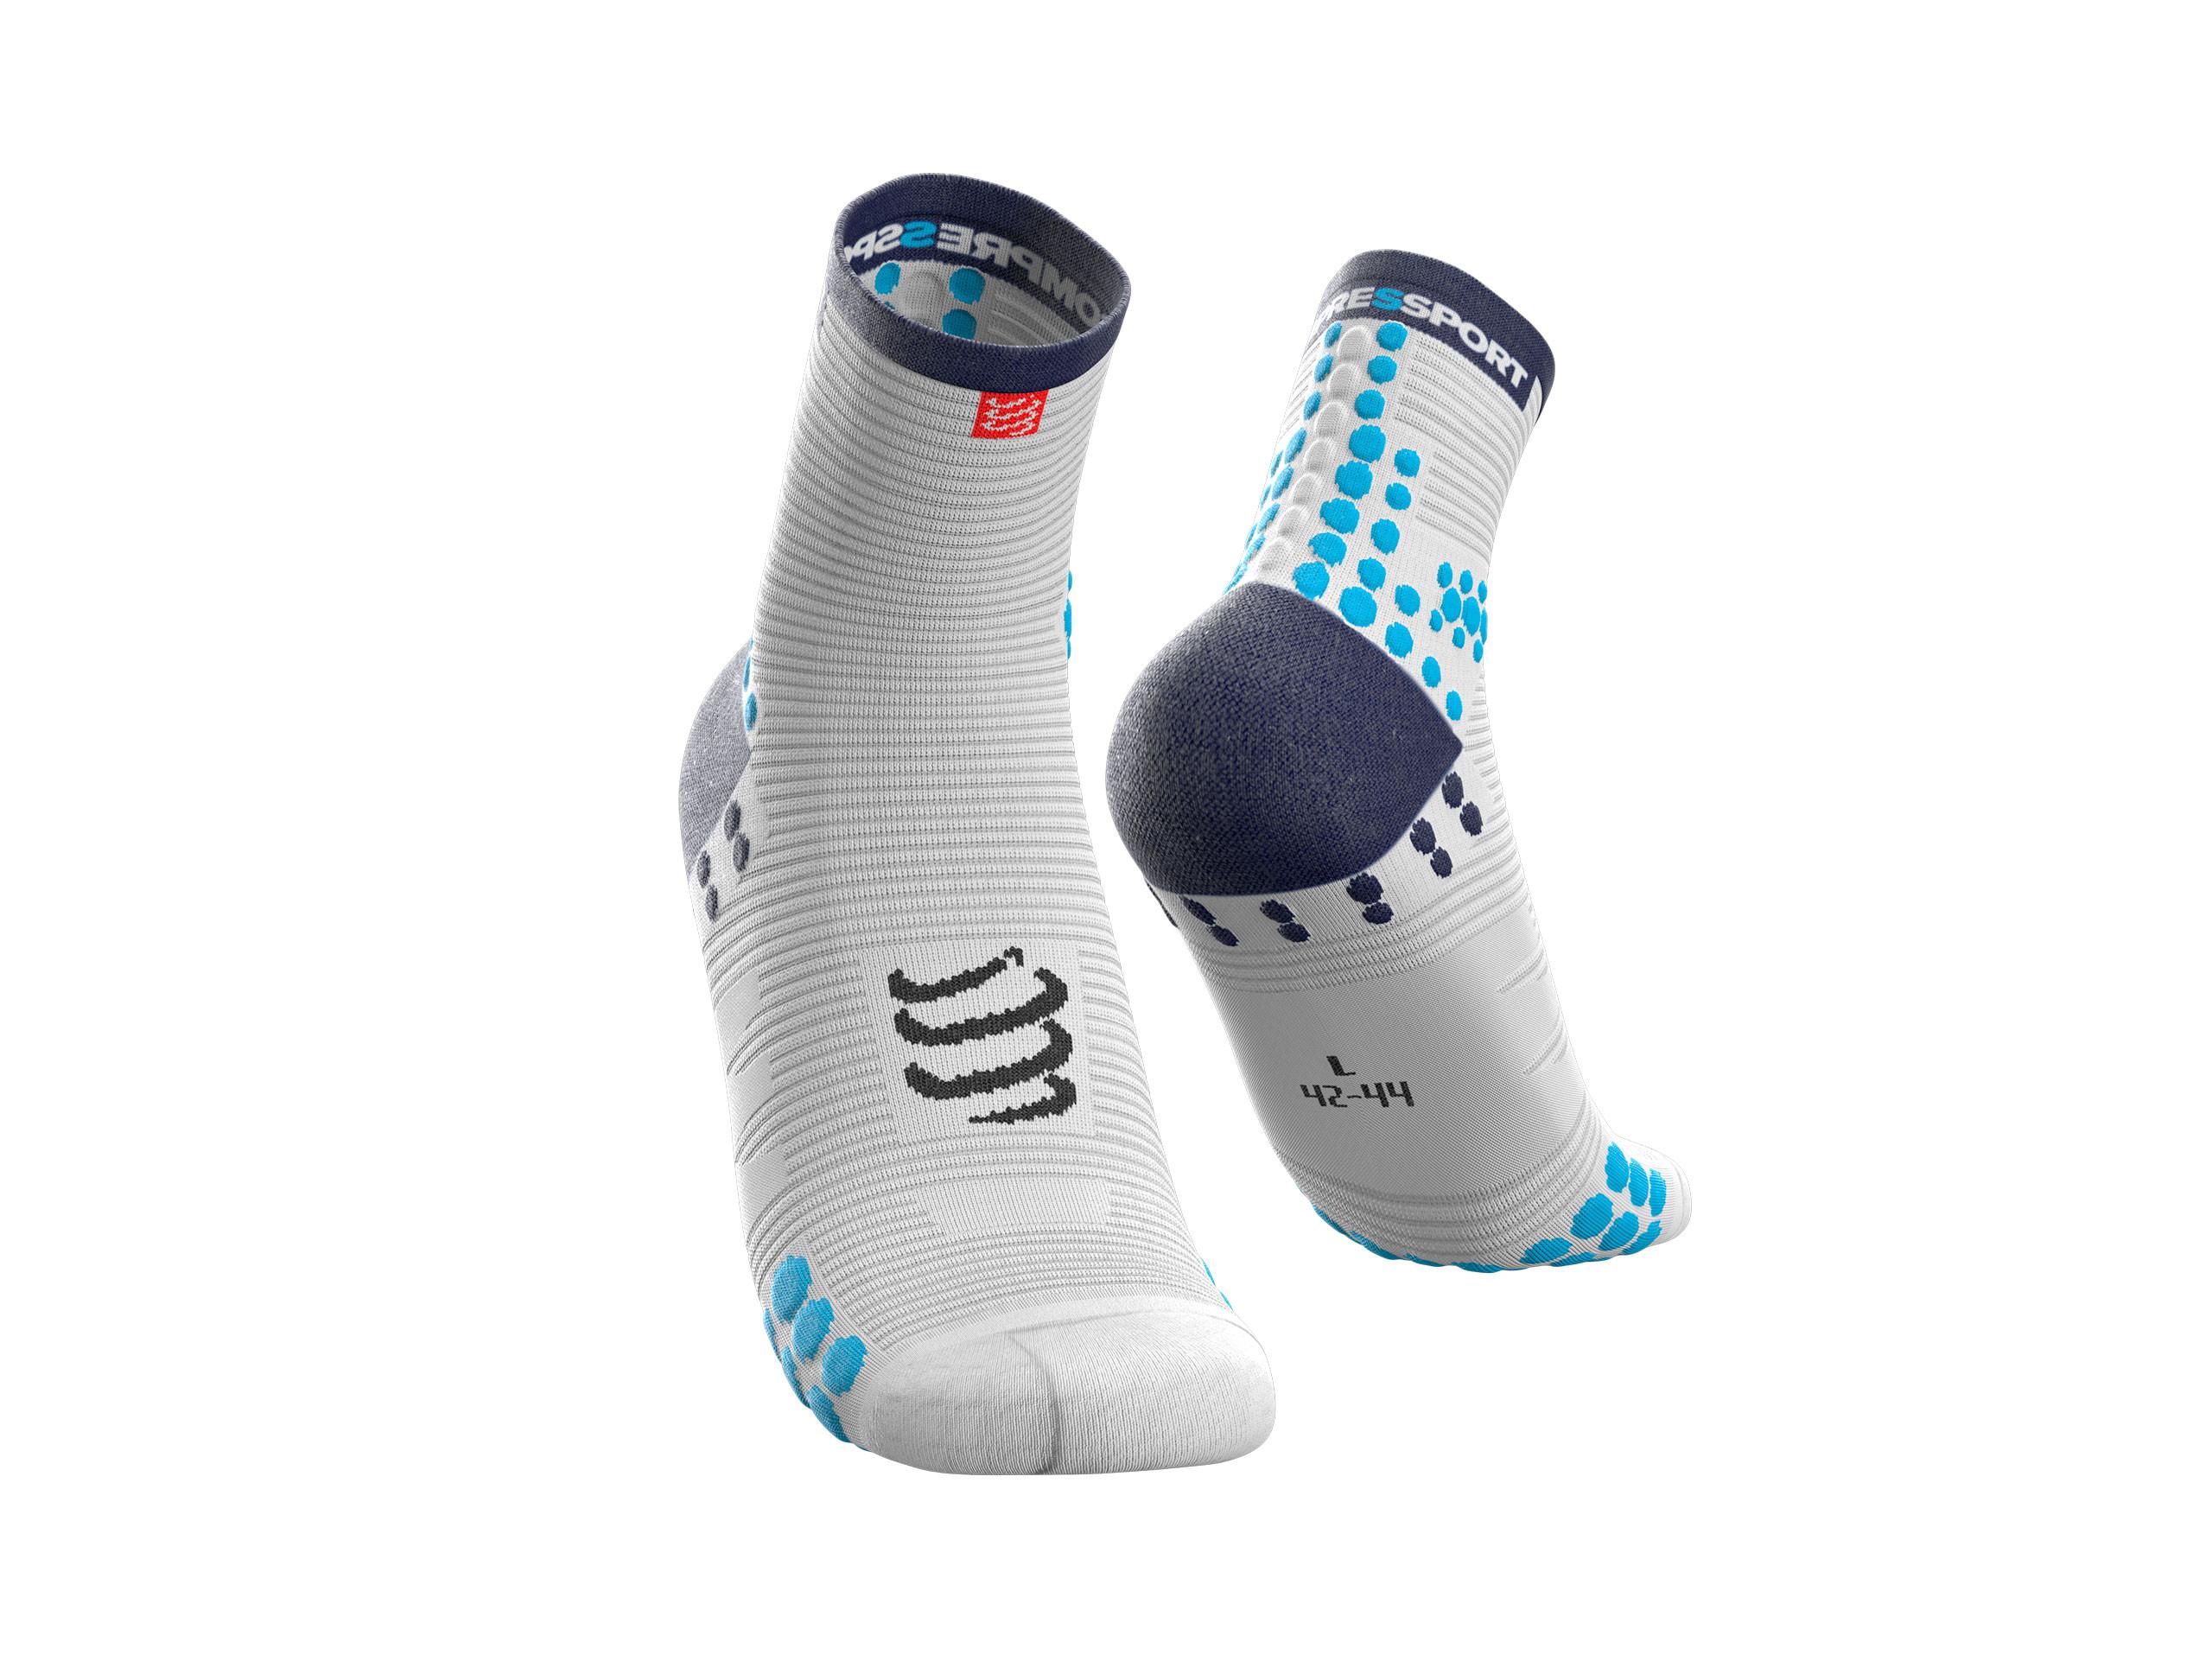 Calcetines deportivos pro v3.0 Run High blanco/azul